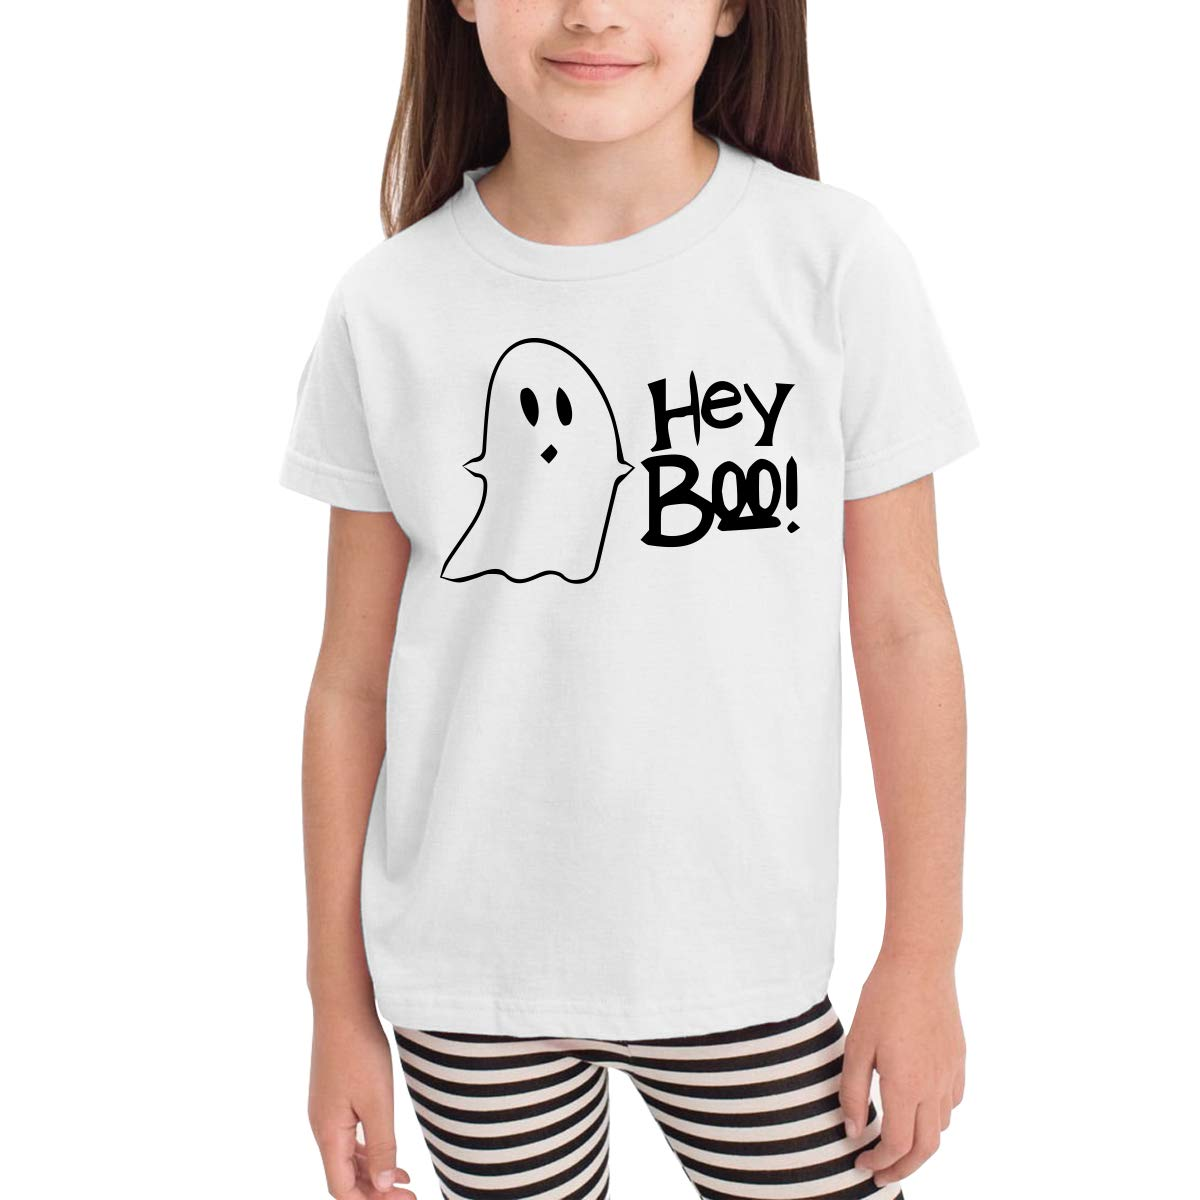 RTKYB-C Childrens Hey Boo Short Sleeve Tee Leisure Crew Neck Tee